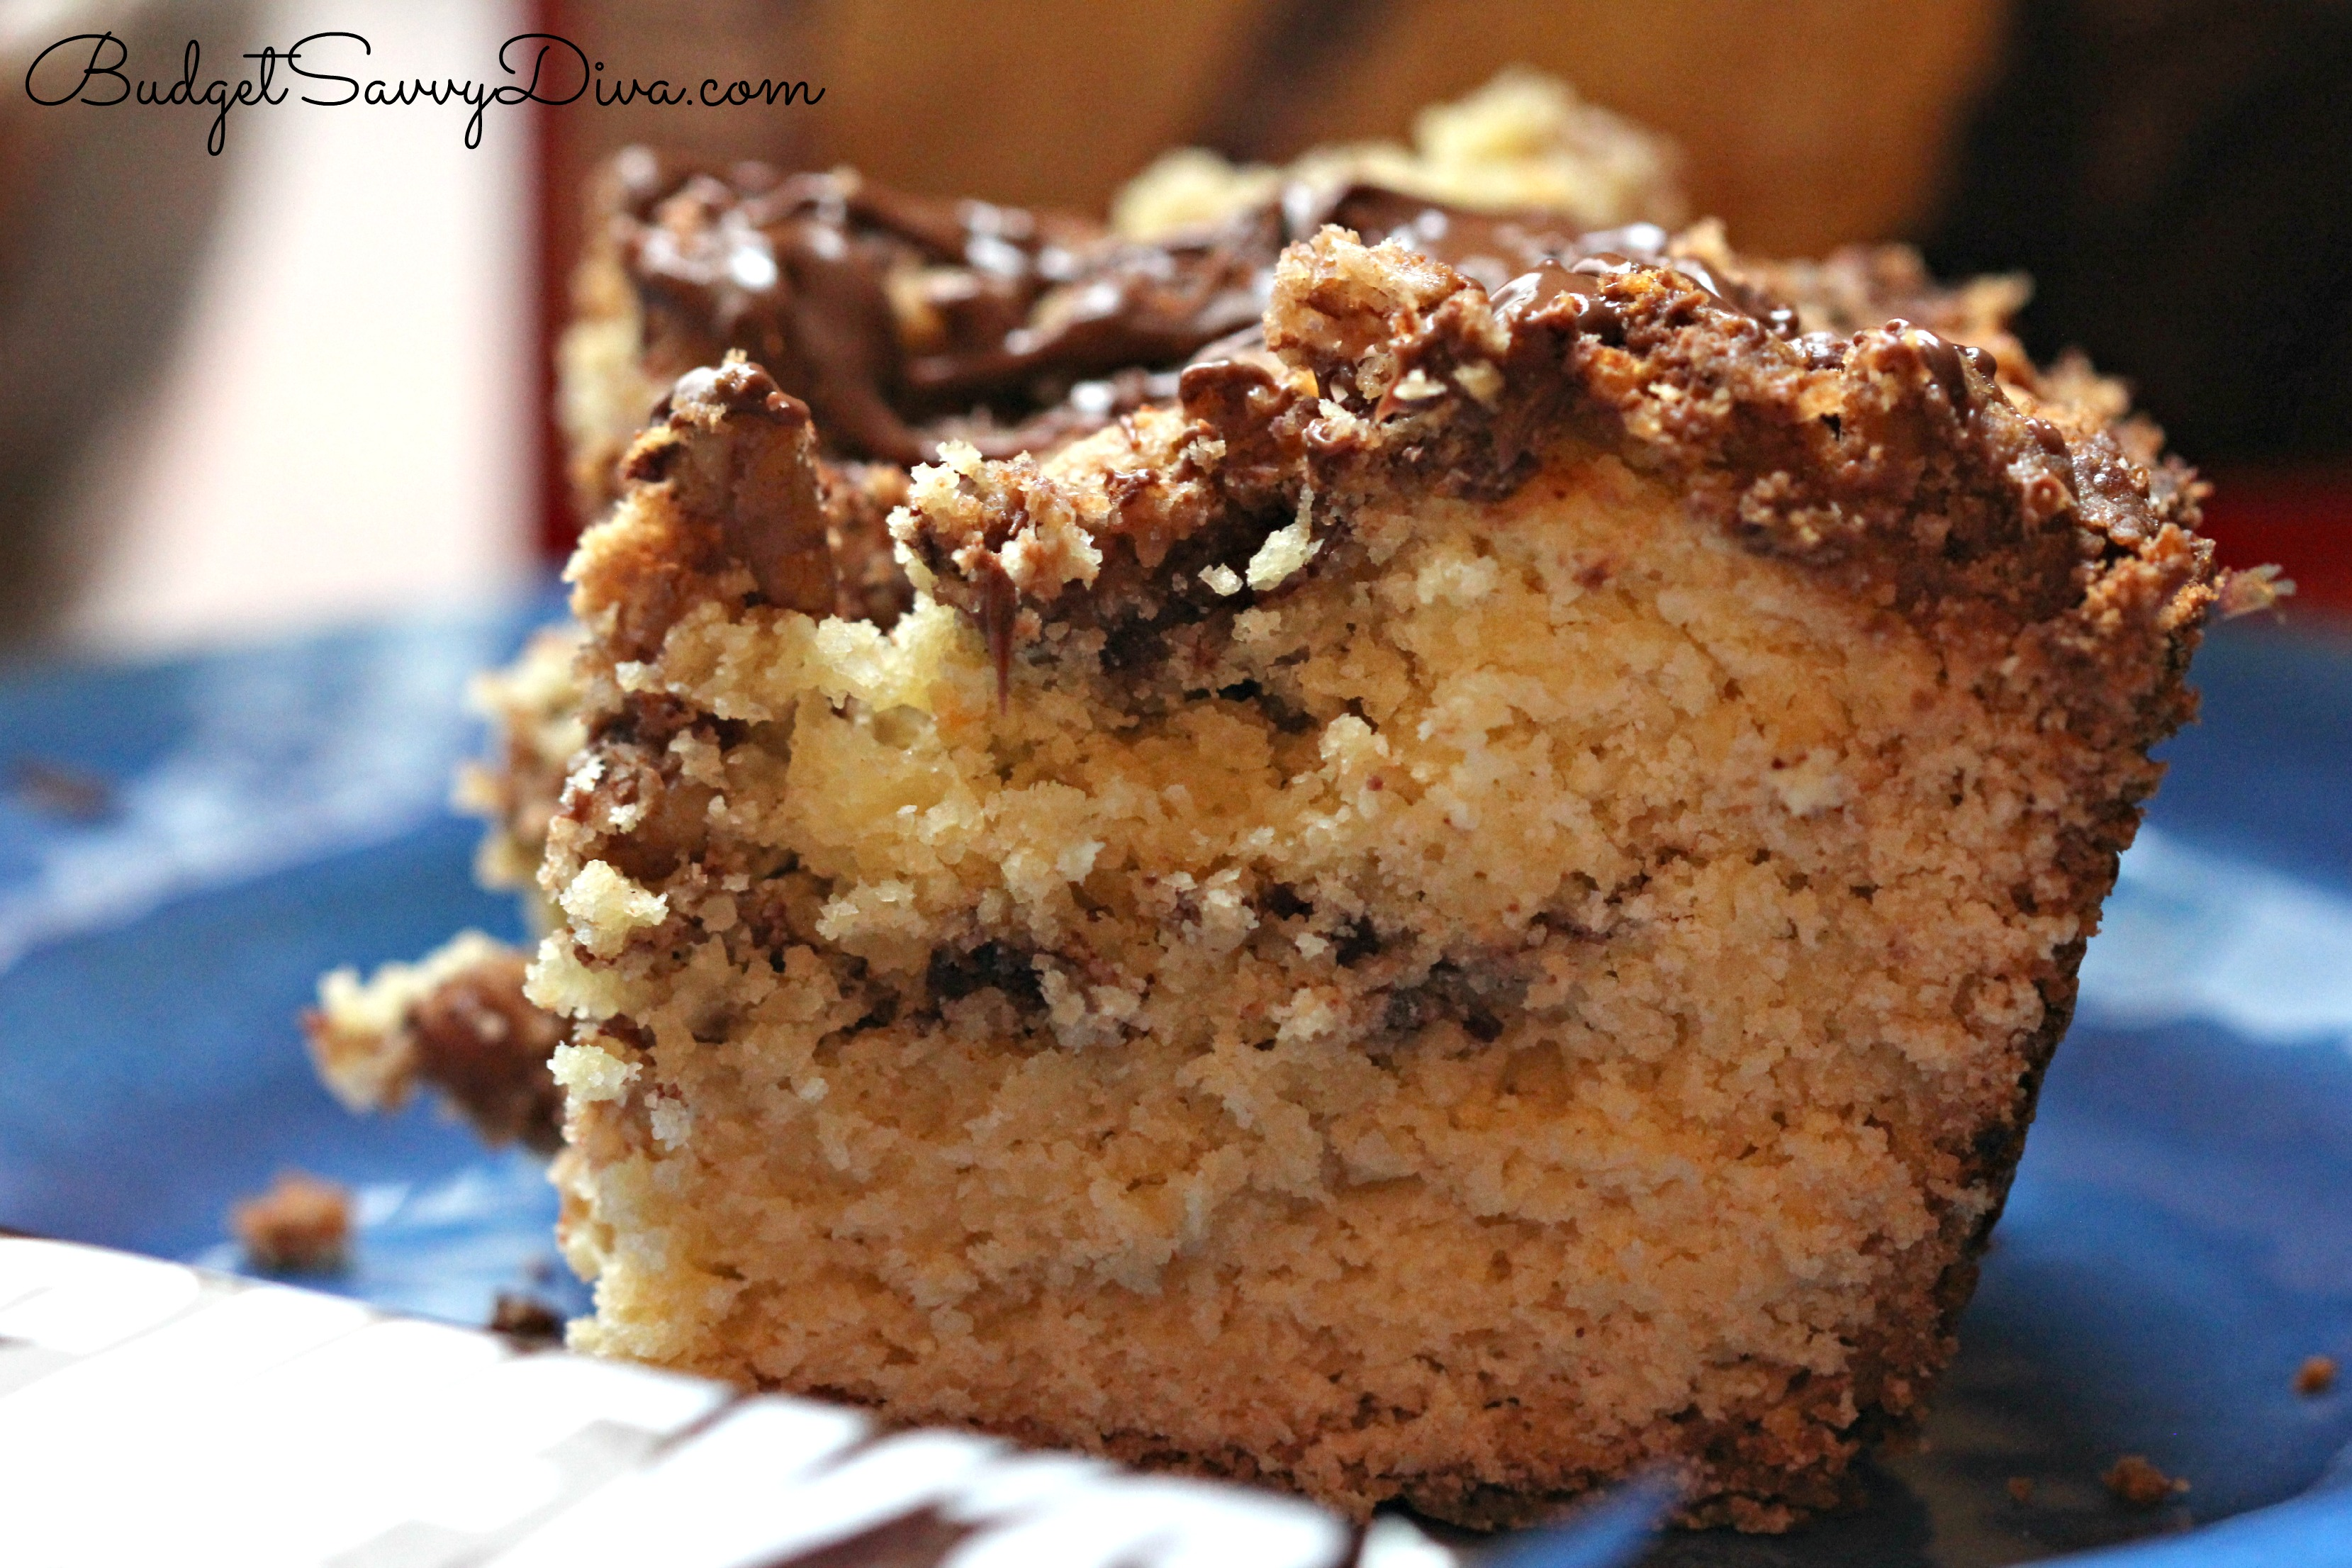 Betty Crocker Chocolate Swirl Cake Mix Recipe